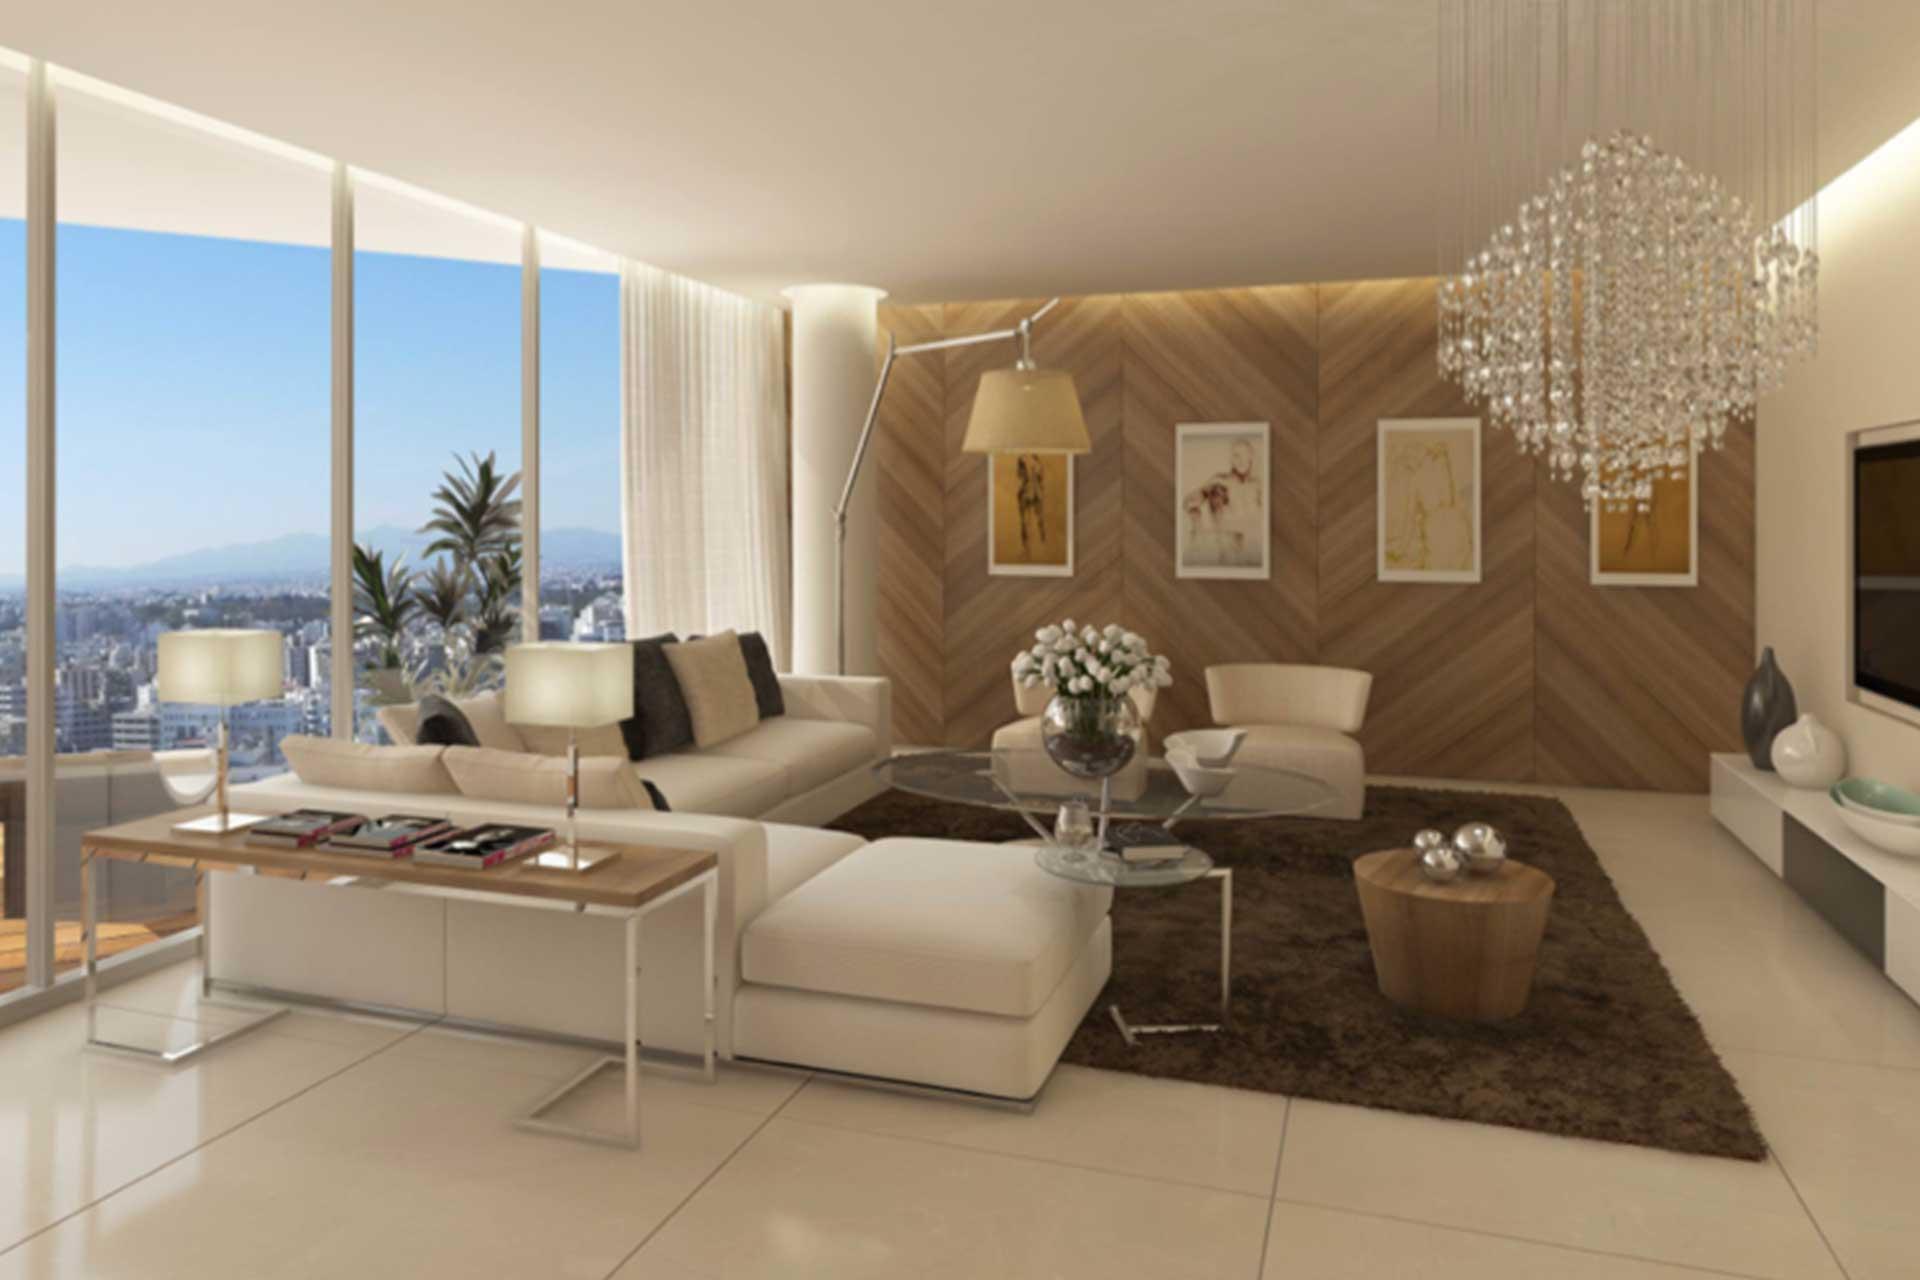 ELEMEC GBC - Projects, Nicosia Central Park Building